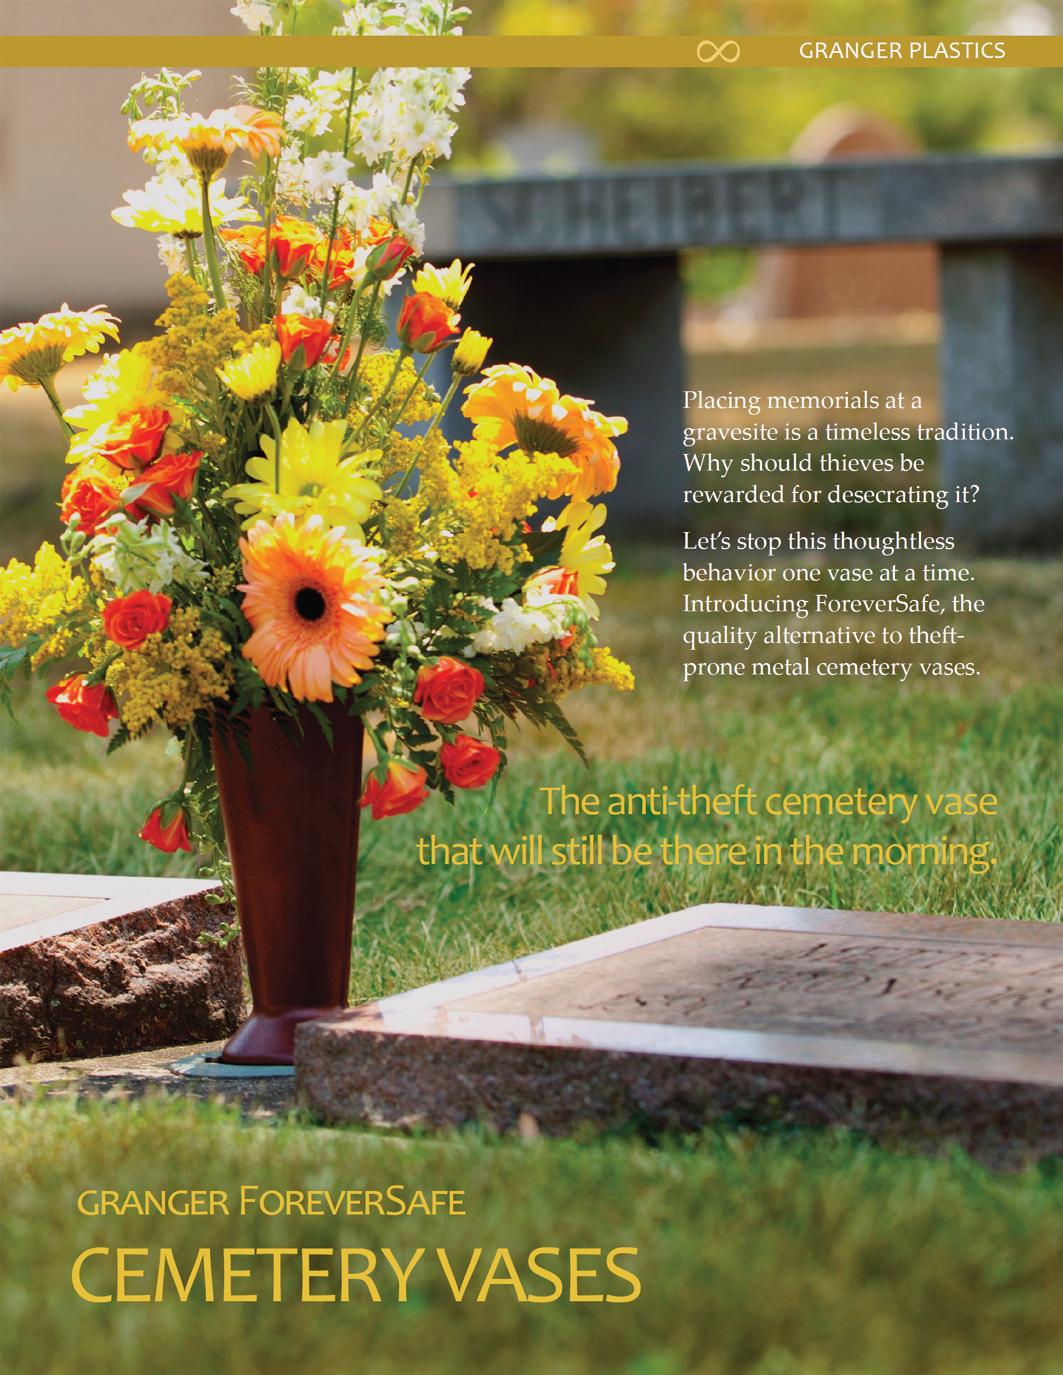 Cemetery Vases Memorial Vases Replacement Vases Cemetery Flower Vases Theft Deterrent Cemetery Vases